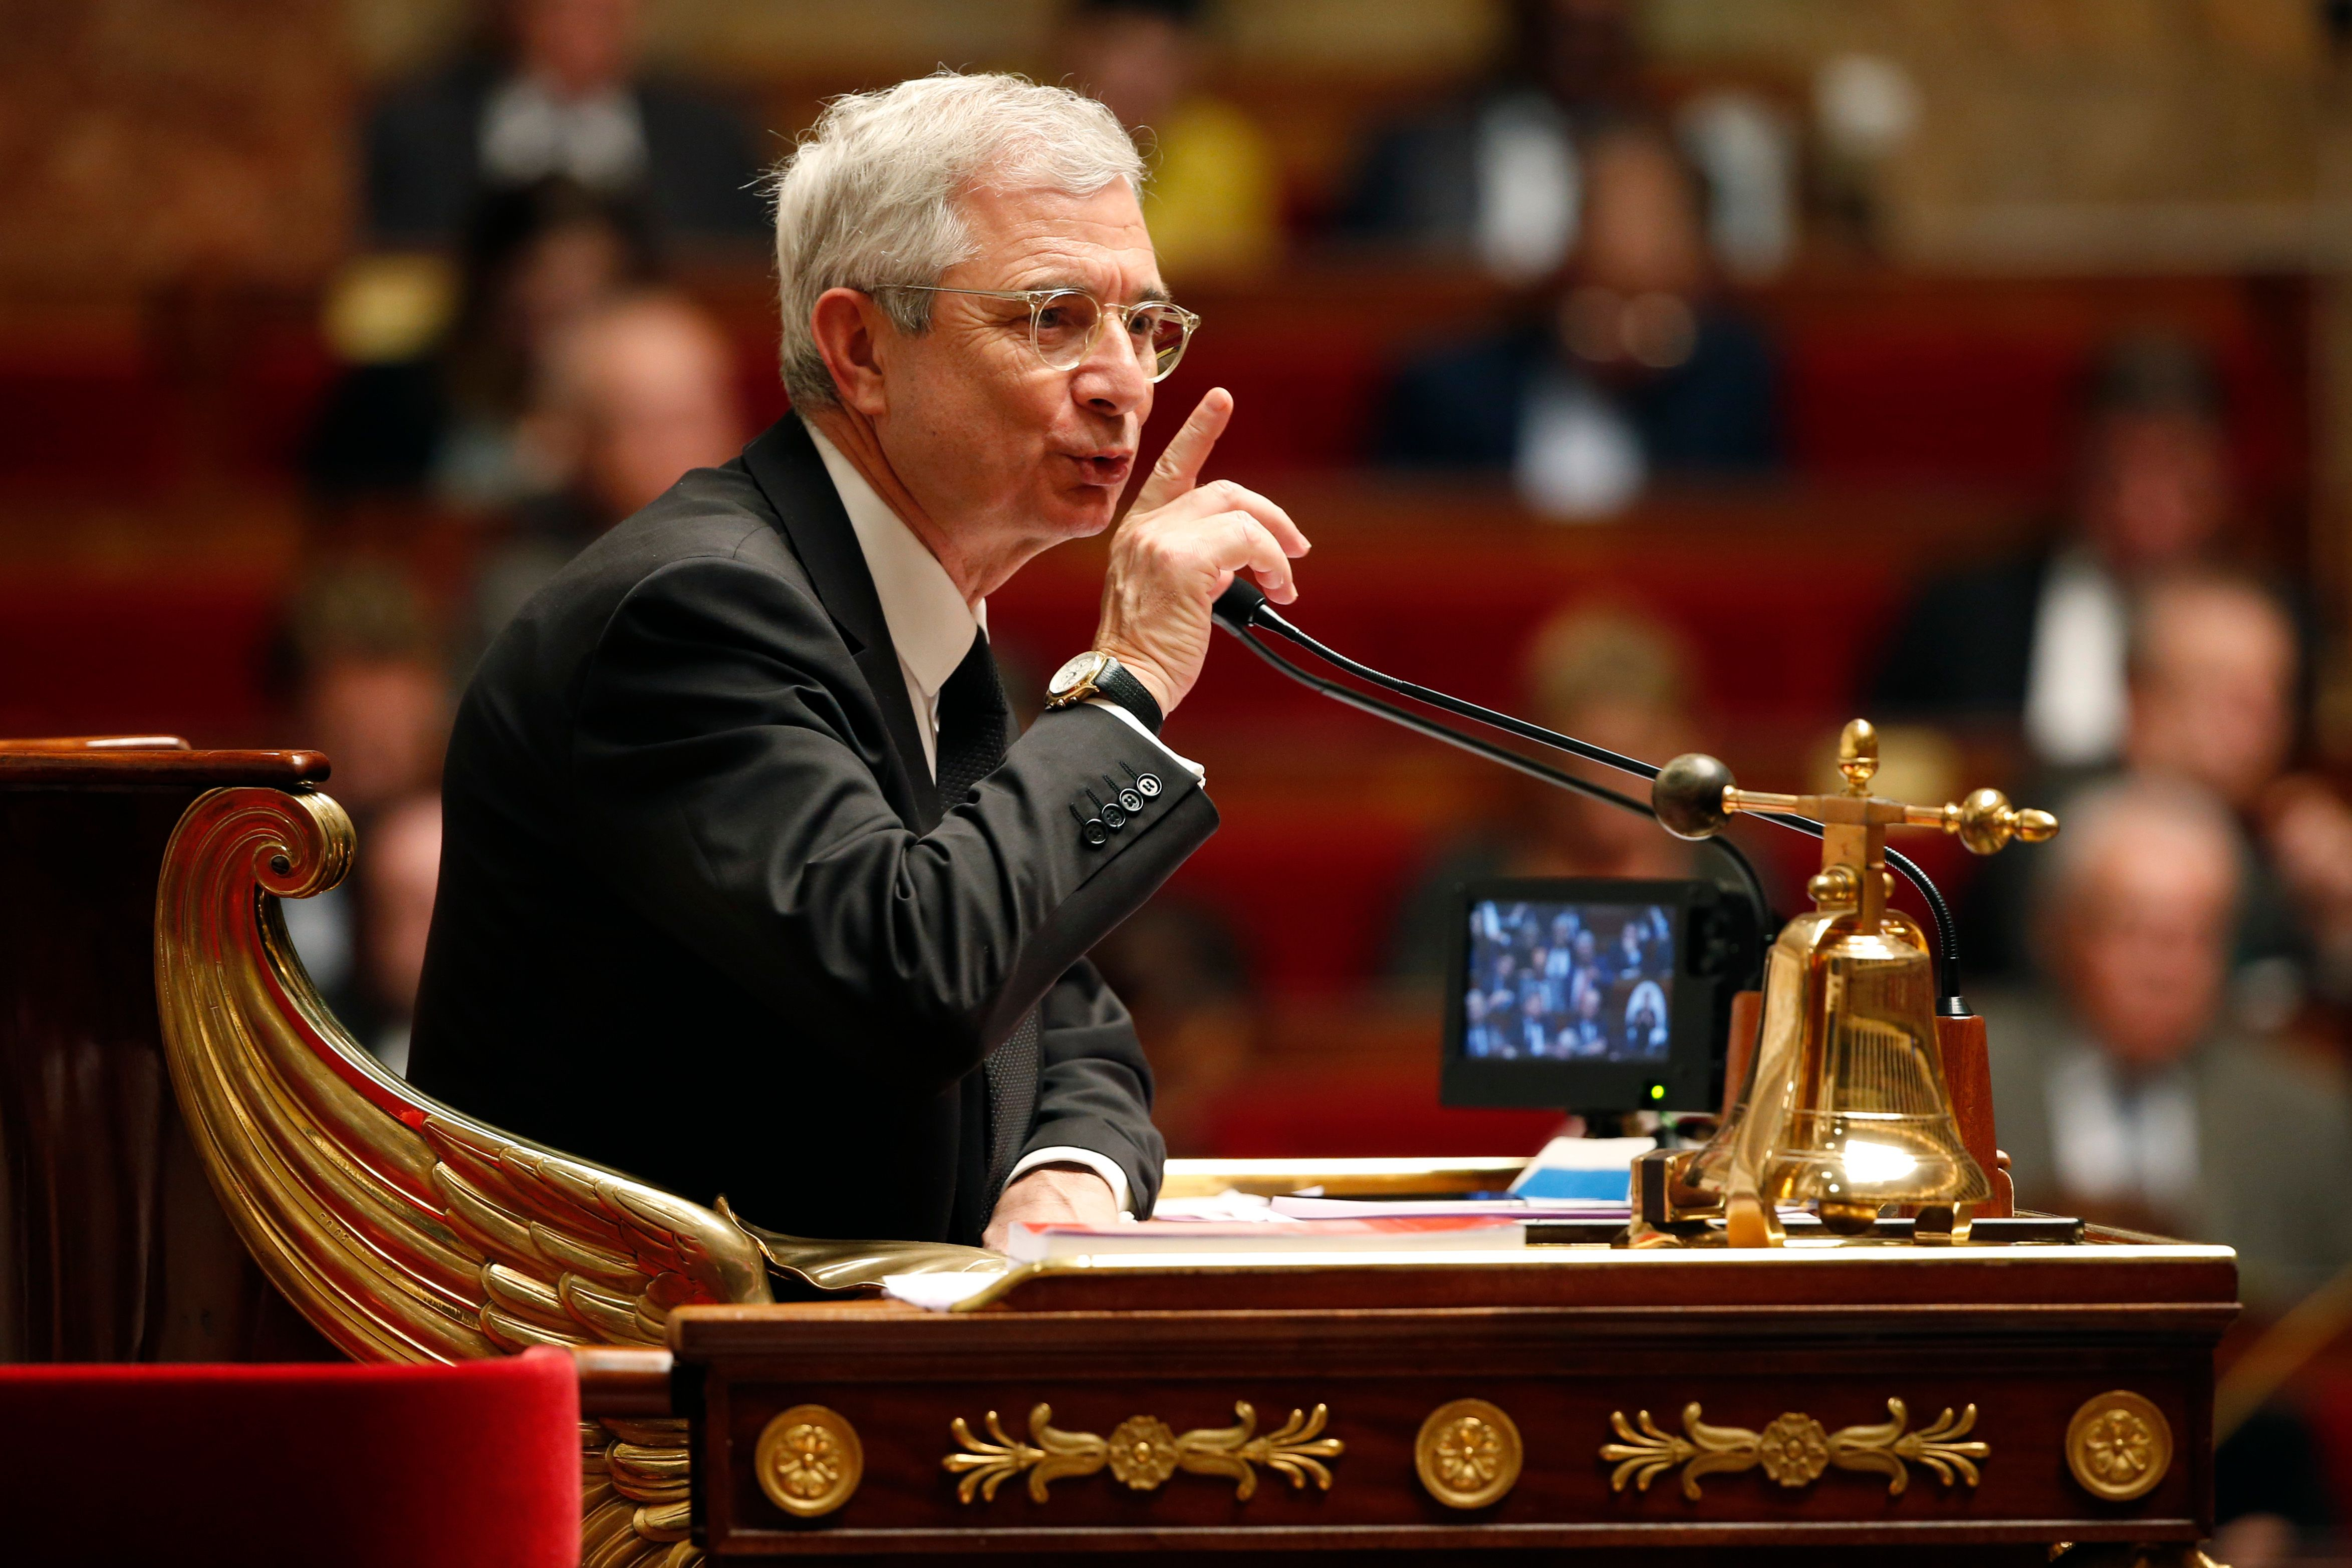 Législatives 2017 : Claude Bartolone ne se représentera pas